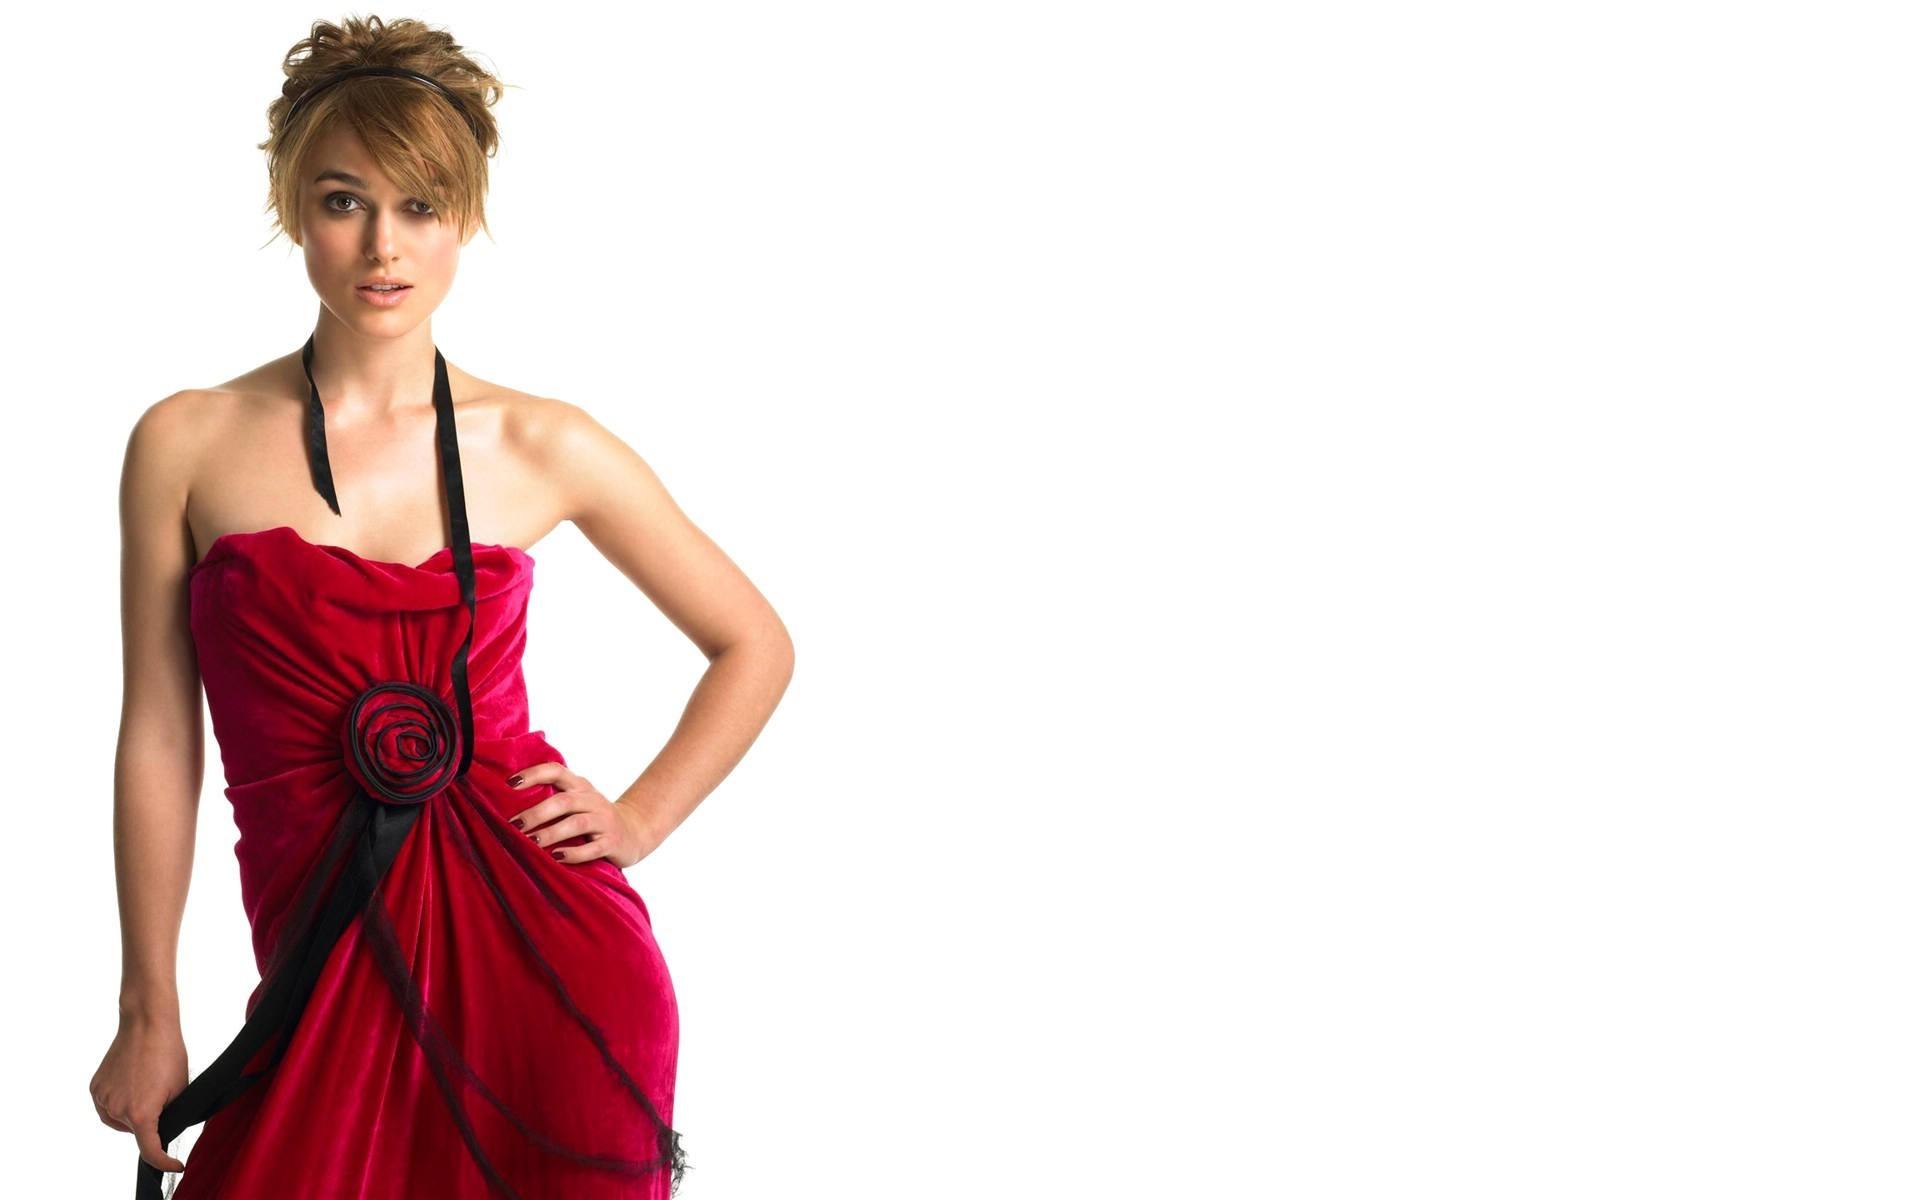 Hintergrundbilder : Frau, Brünette, Berühmtheit, Darstellerin, Kleid ...